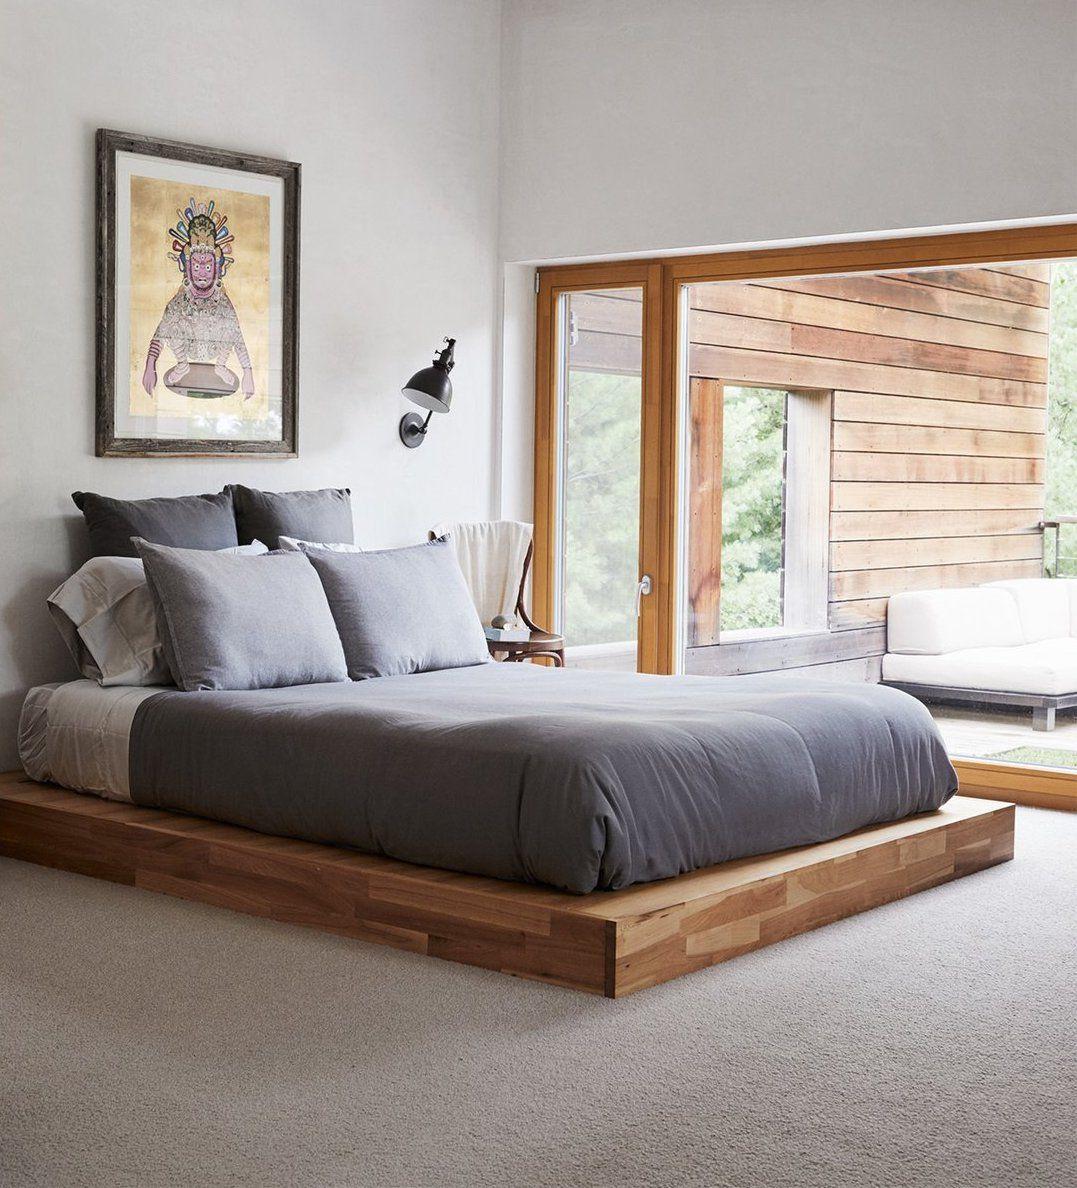 Floor Bed Frame Low Platform Bed In 2021 Bed Furniture Design Luxury Bedroom Master Small Bedroom Inspiration